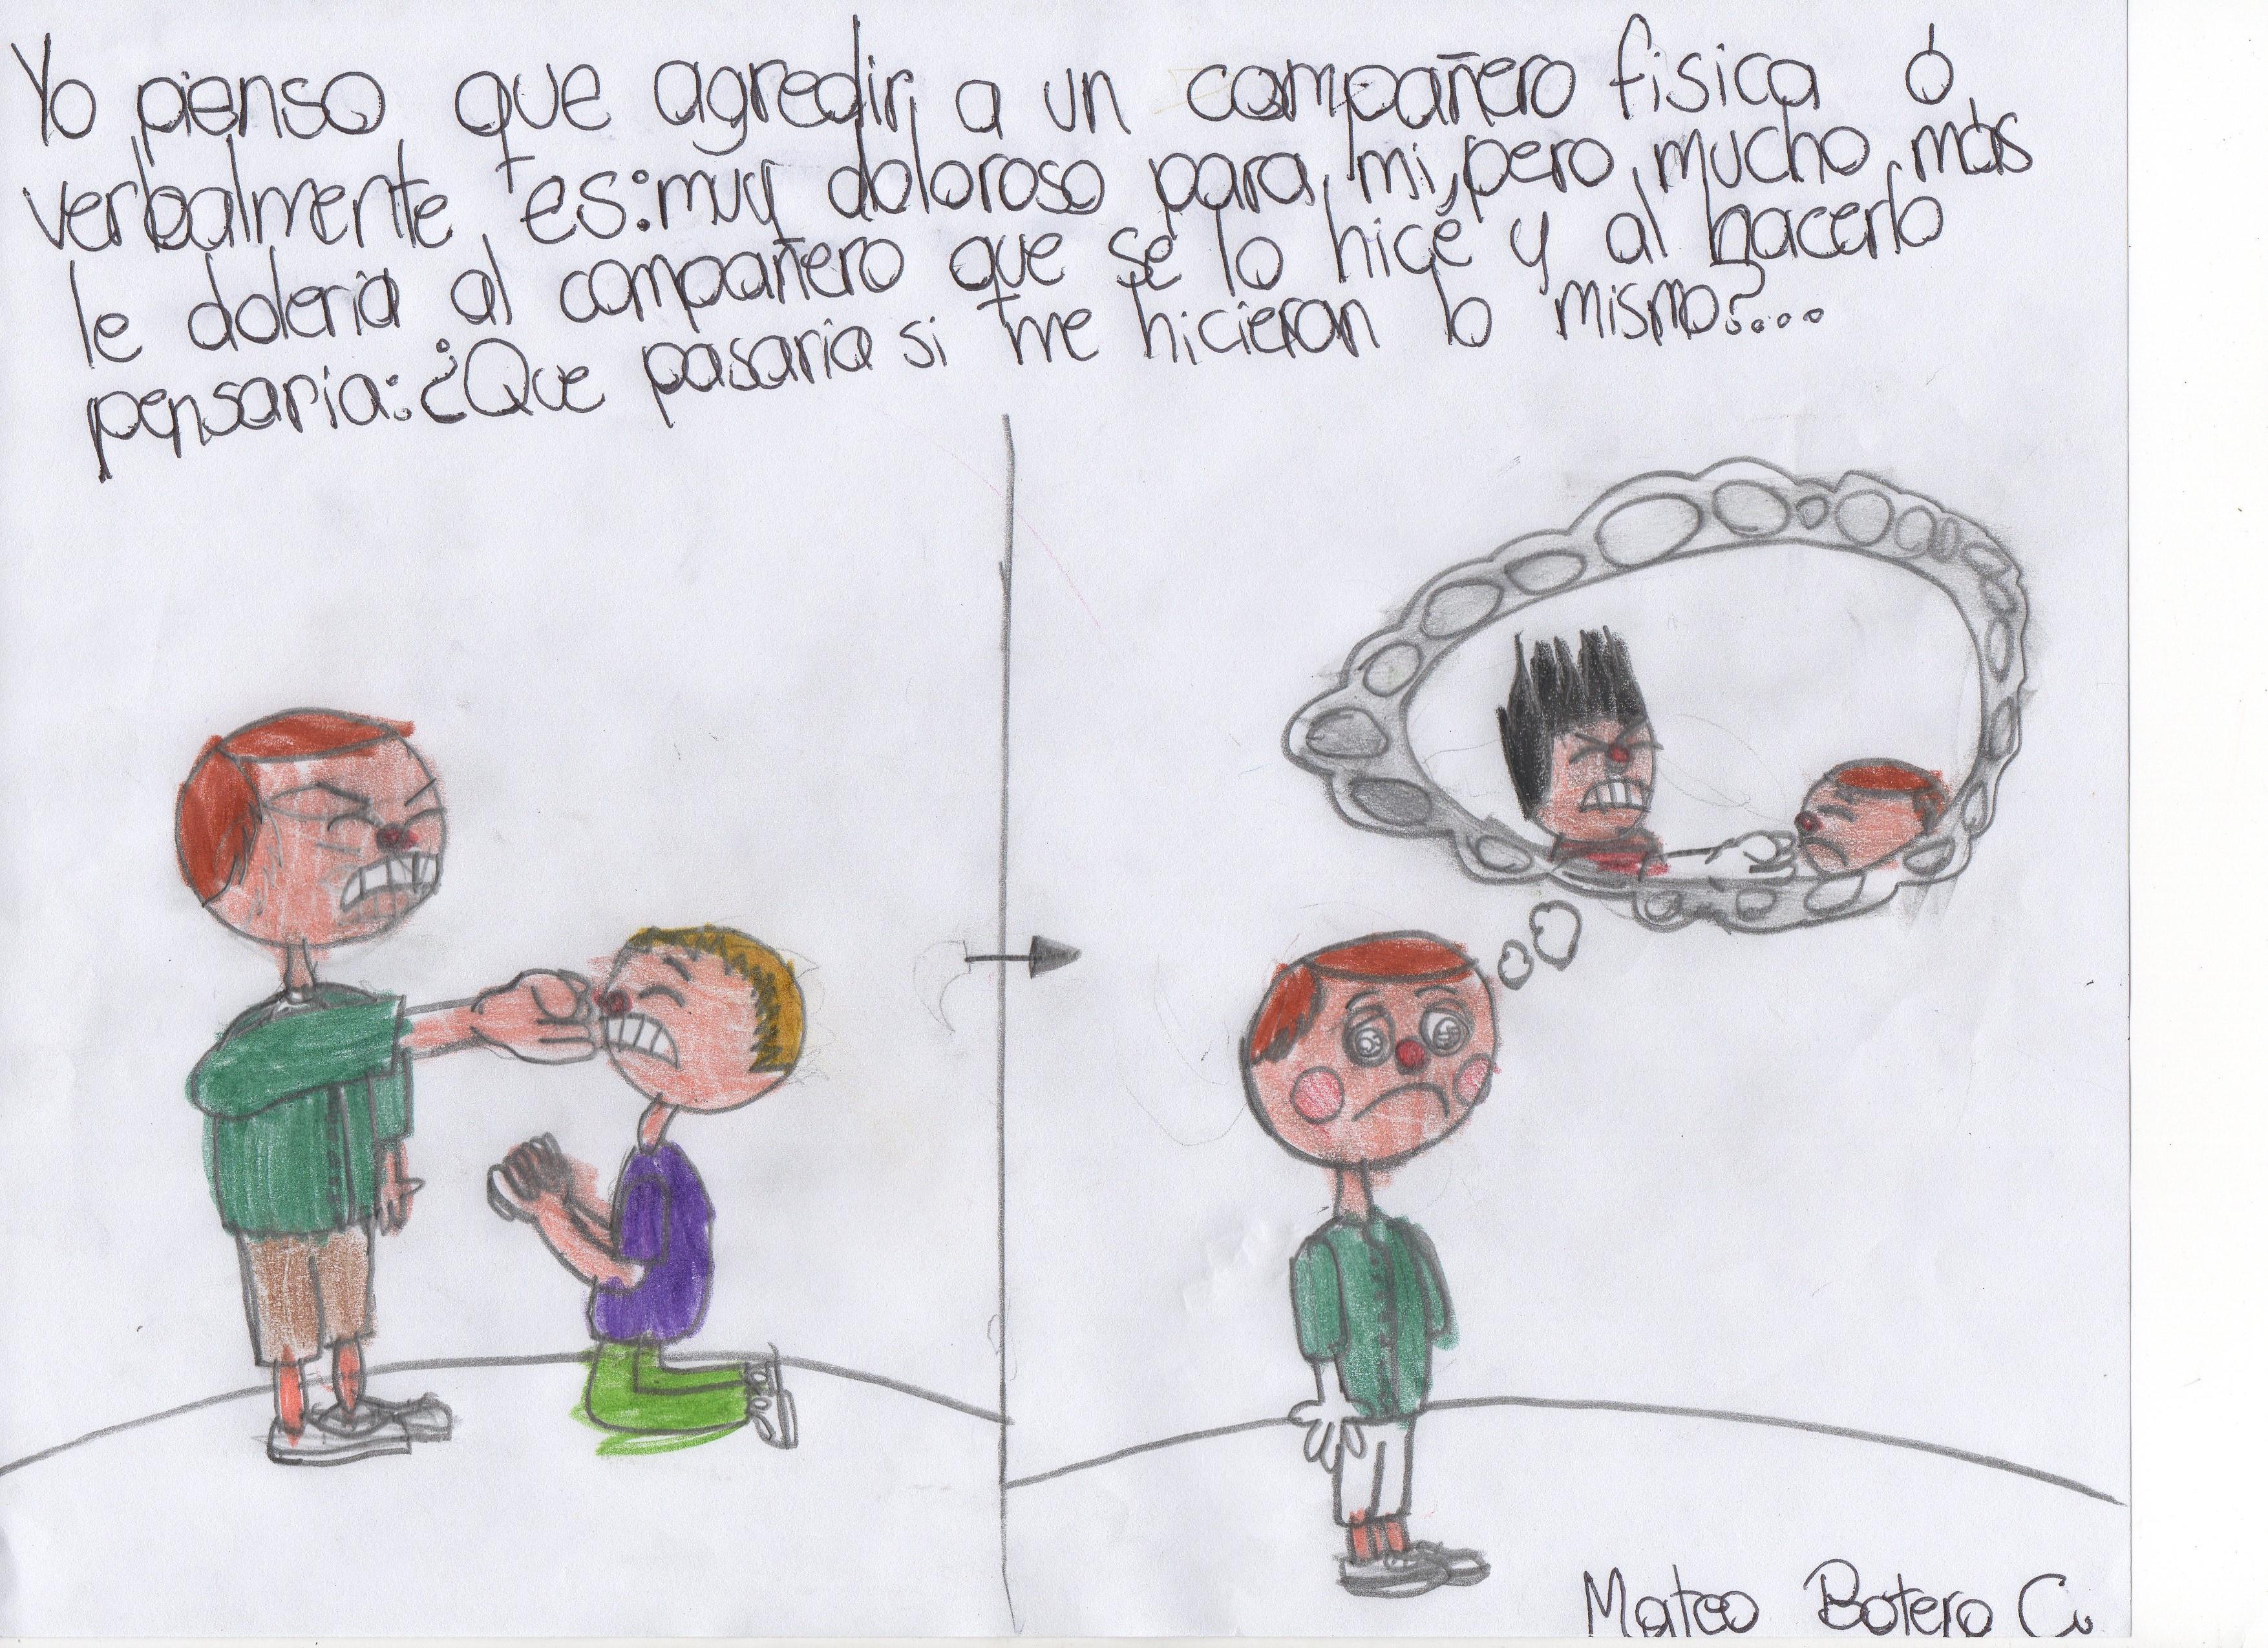 Mateo Botero